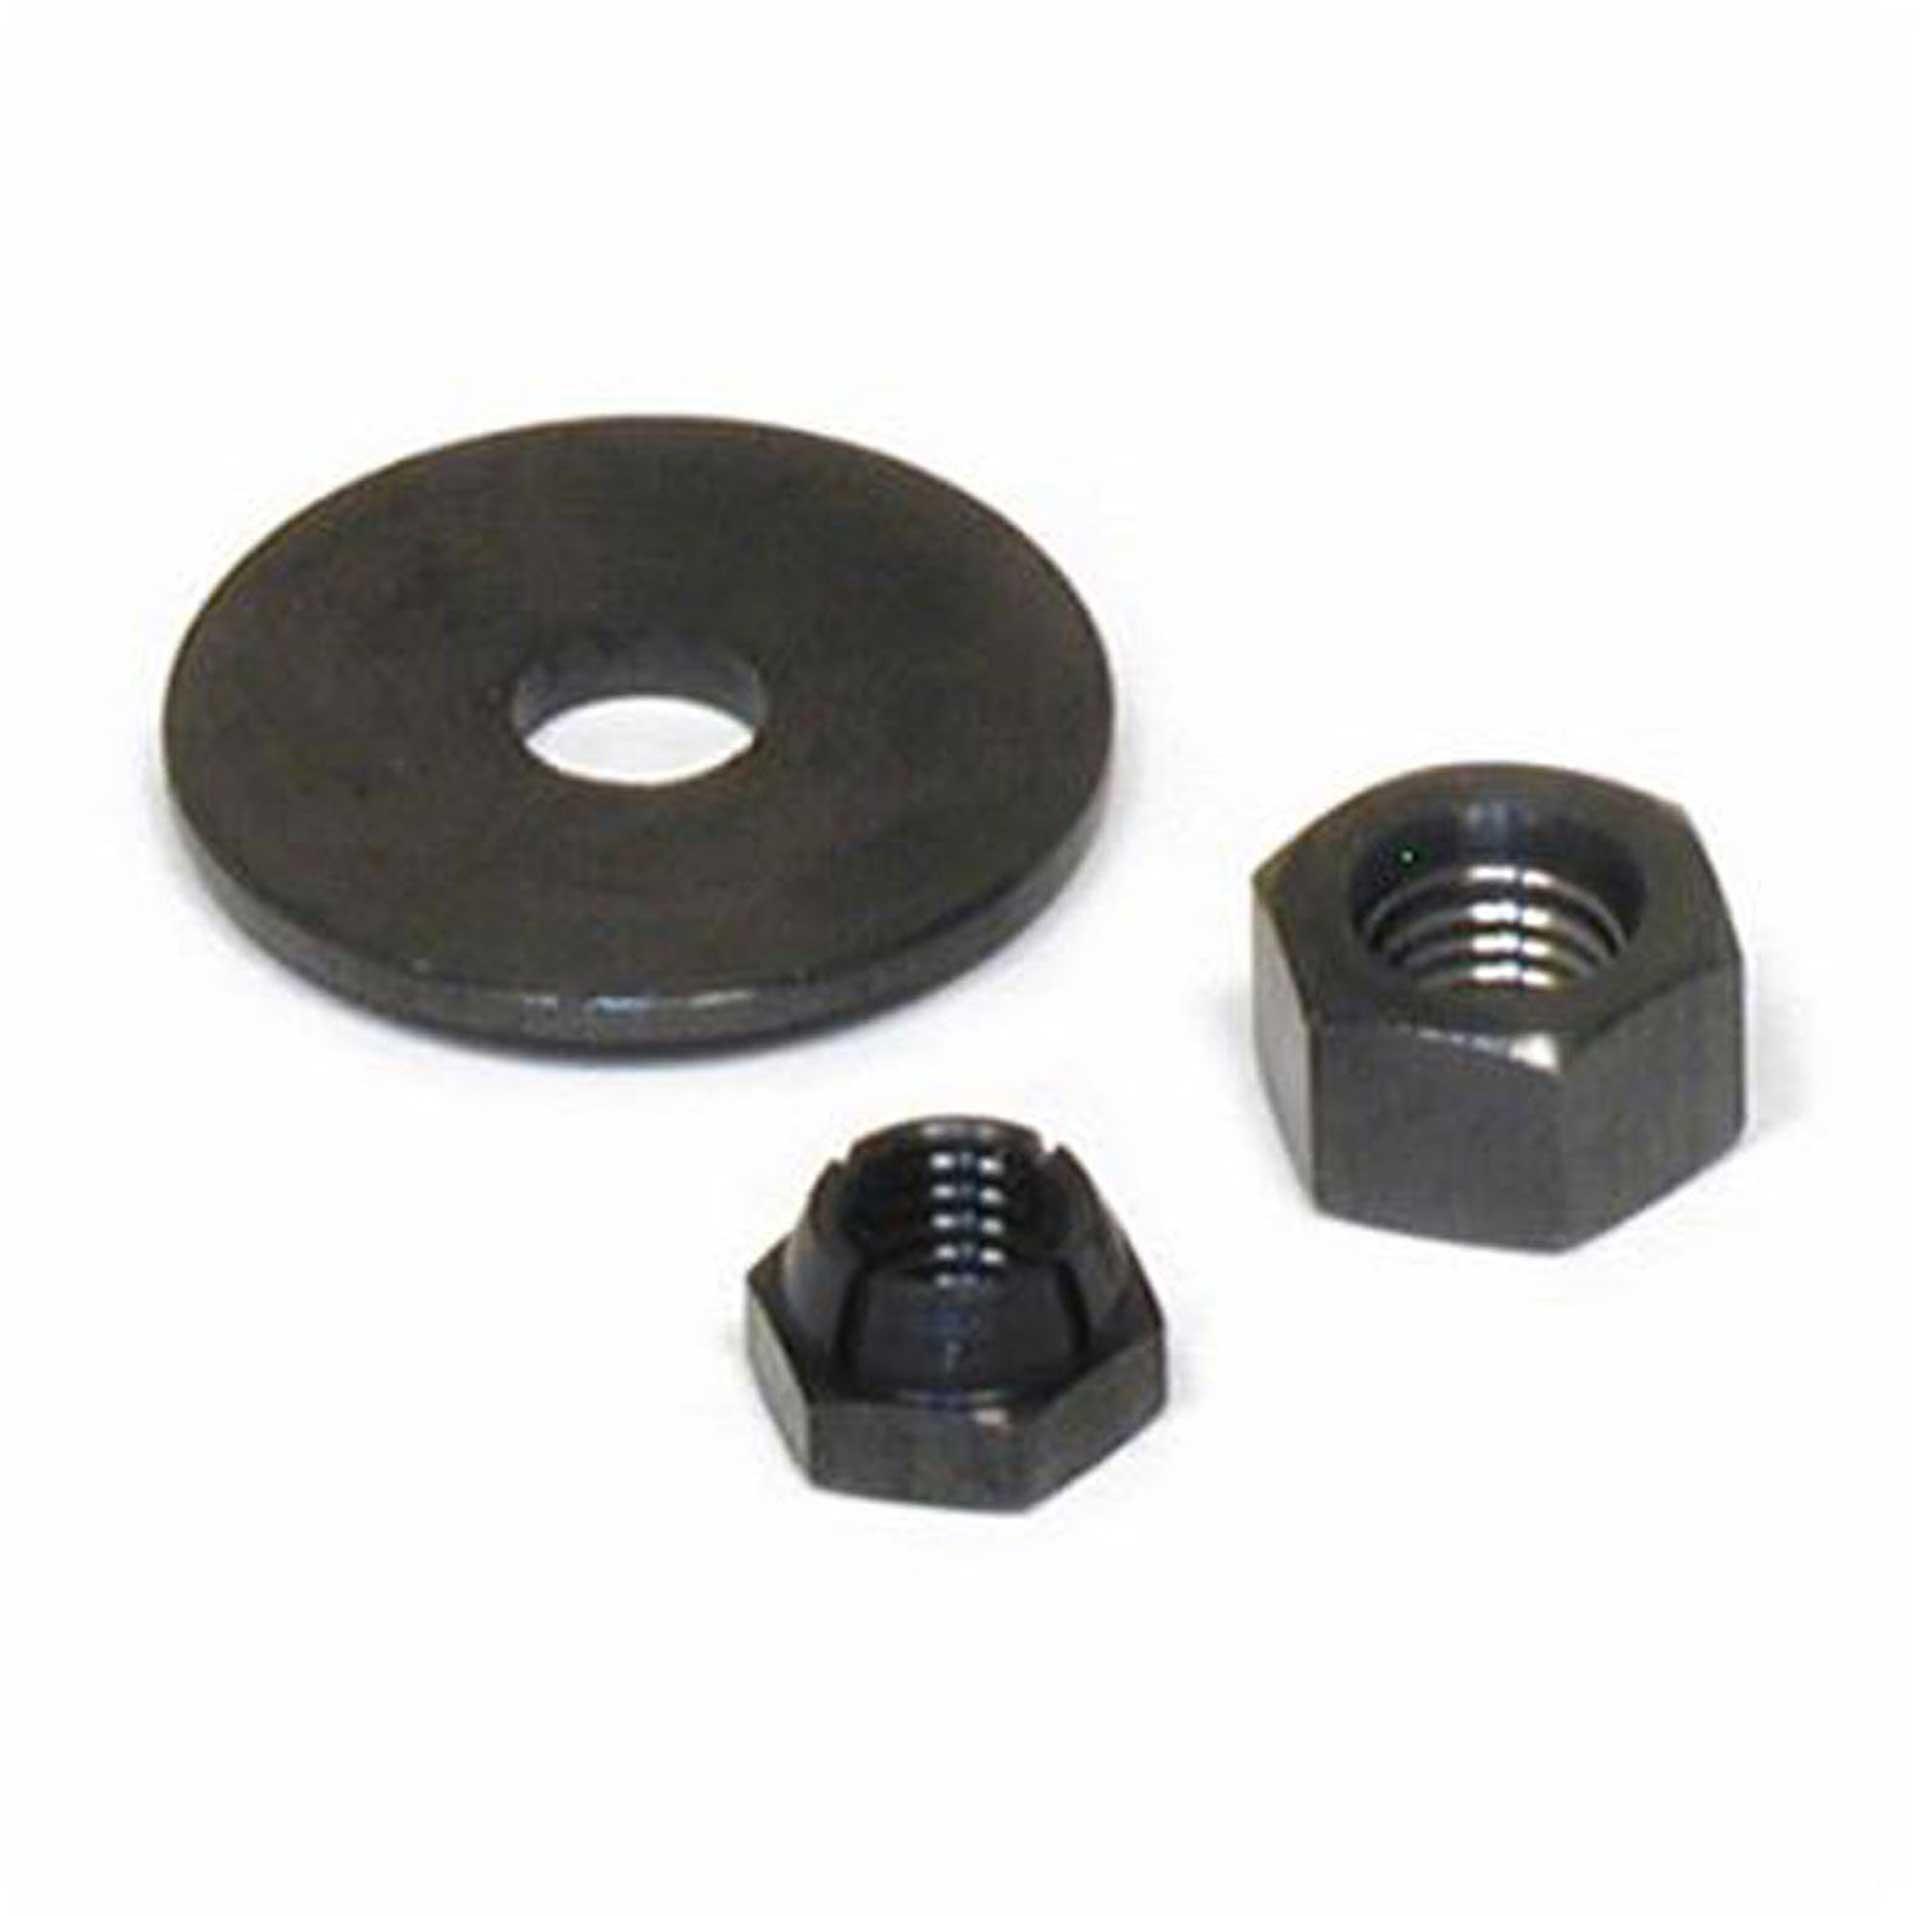 SAITO Prop Washer/Nut/Anti-loosening Nut